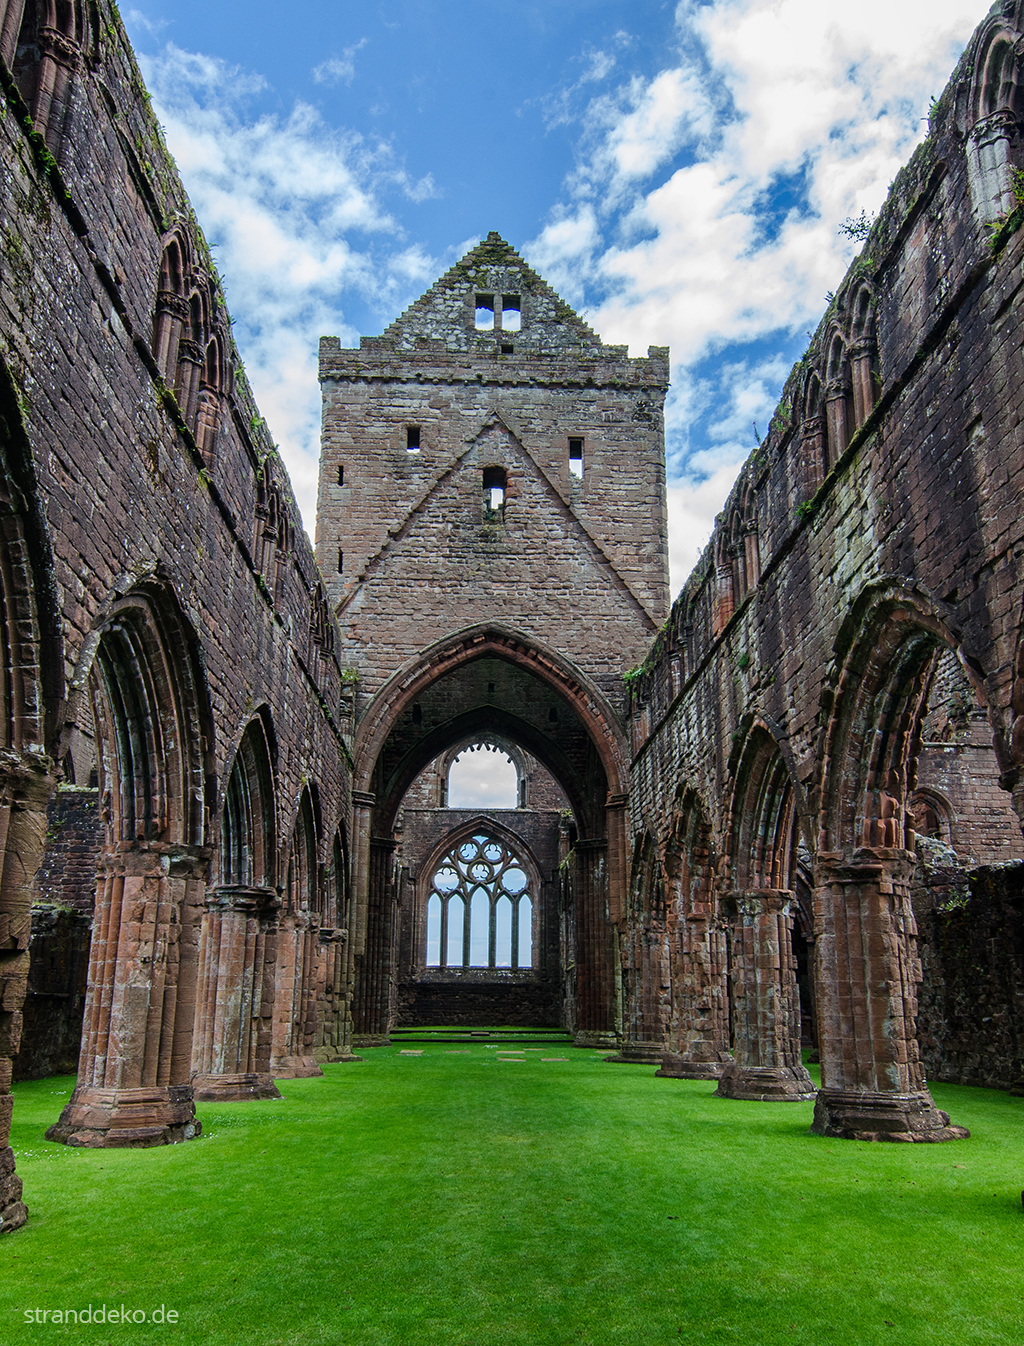 20160714 05 - Schottland V - Süden